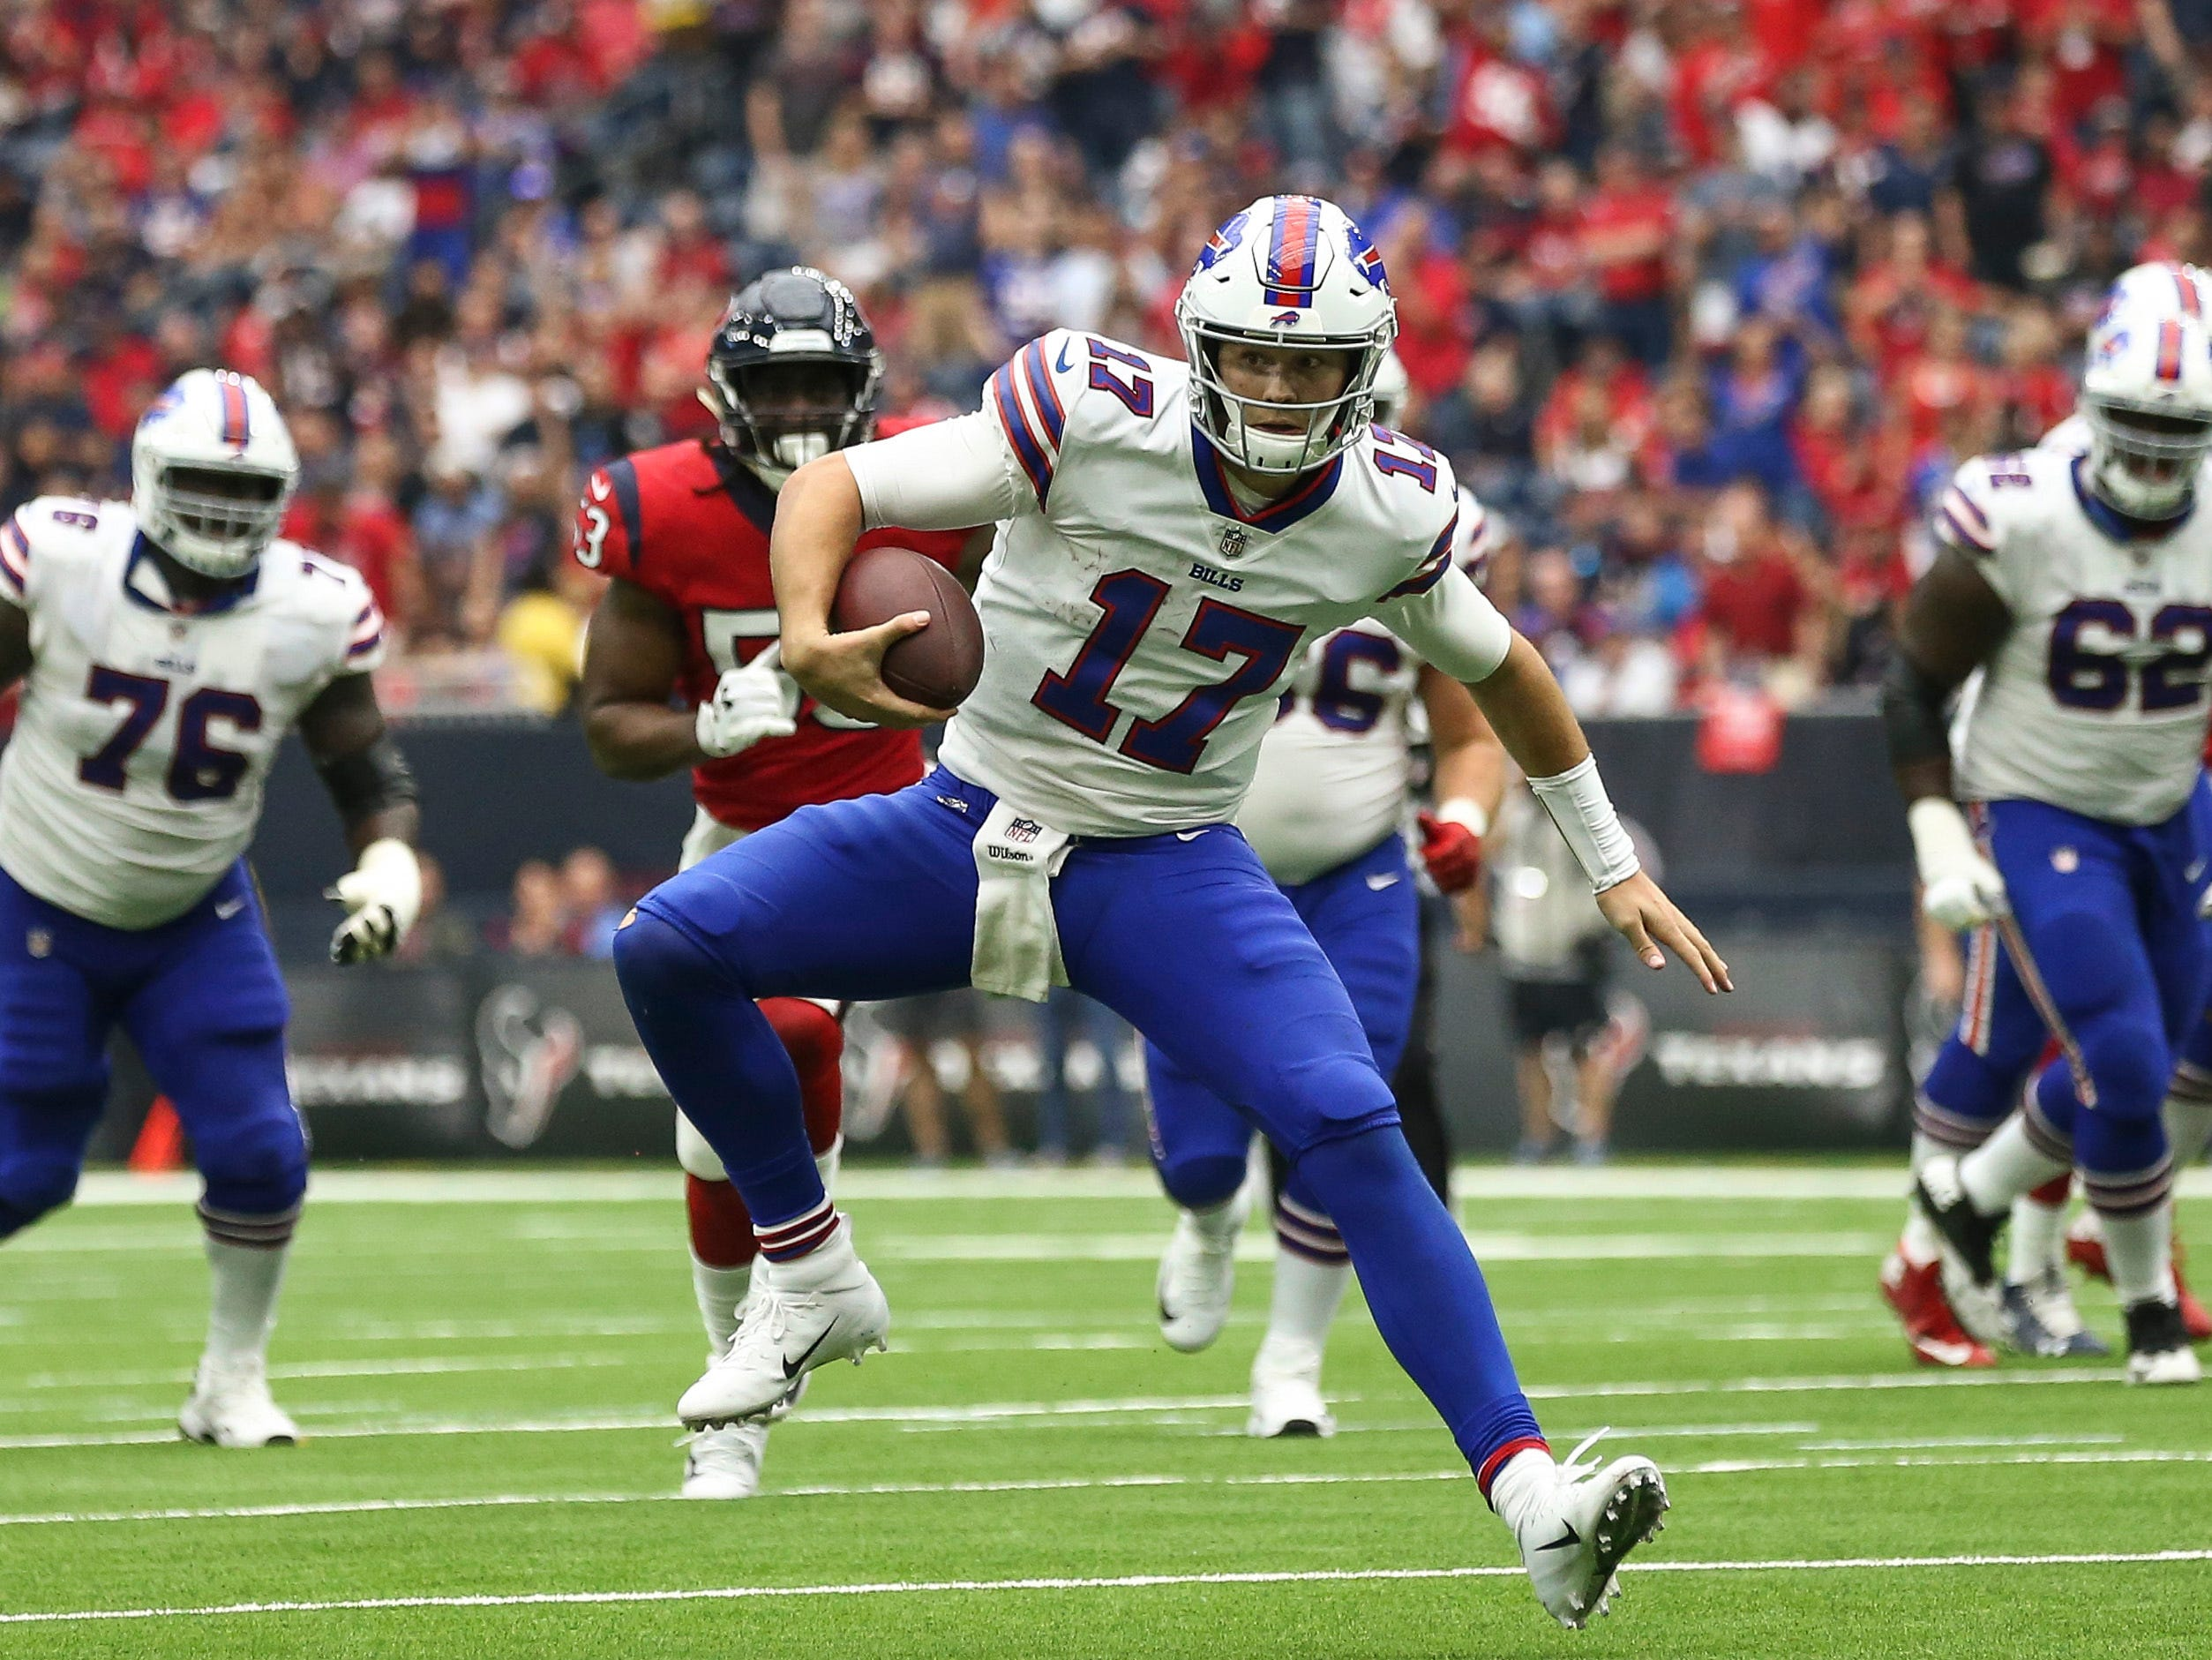 Oct 14, 2018; Houston, TX, USA; Buffalo Bills quarterback Josh Allen (17) runs with the ball during the third quarter against the Houston Texans at NRG Stadium. Mandatory Credit: Troy Taormina-USA TODAY Sports